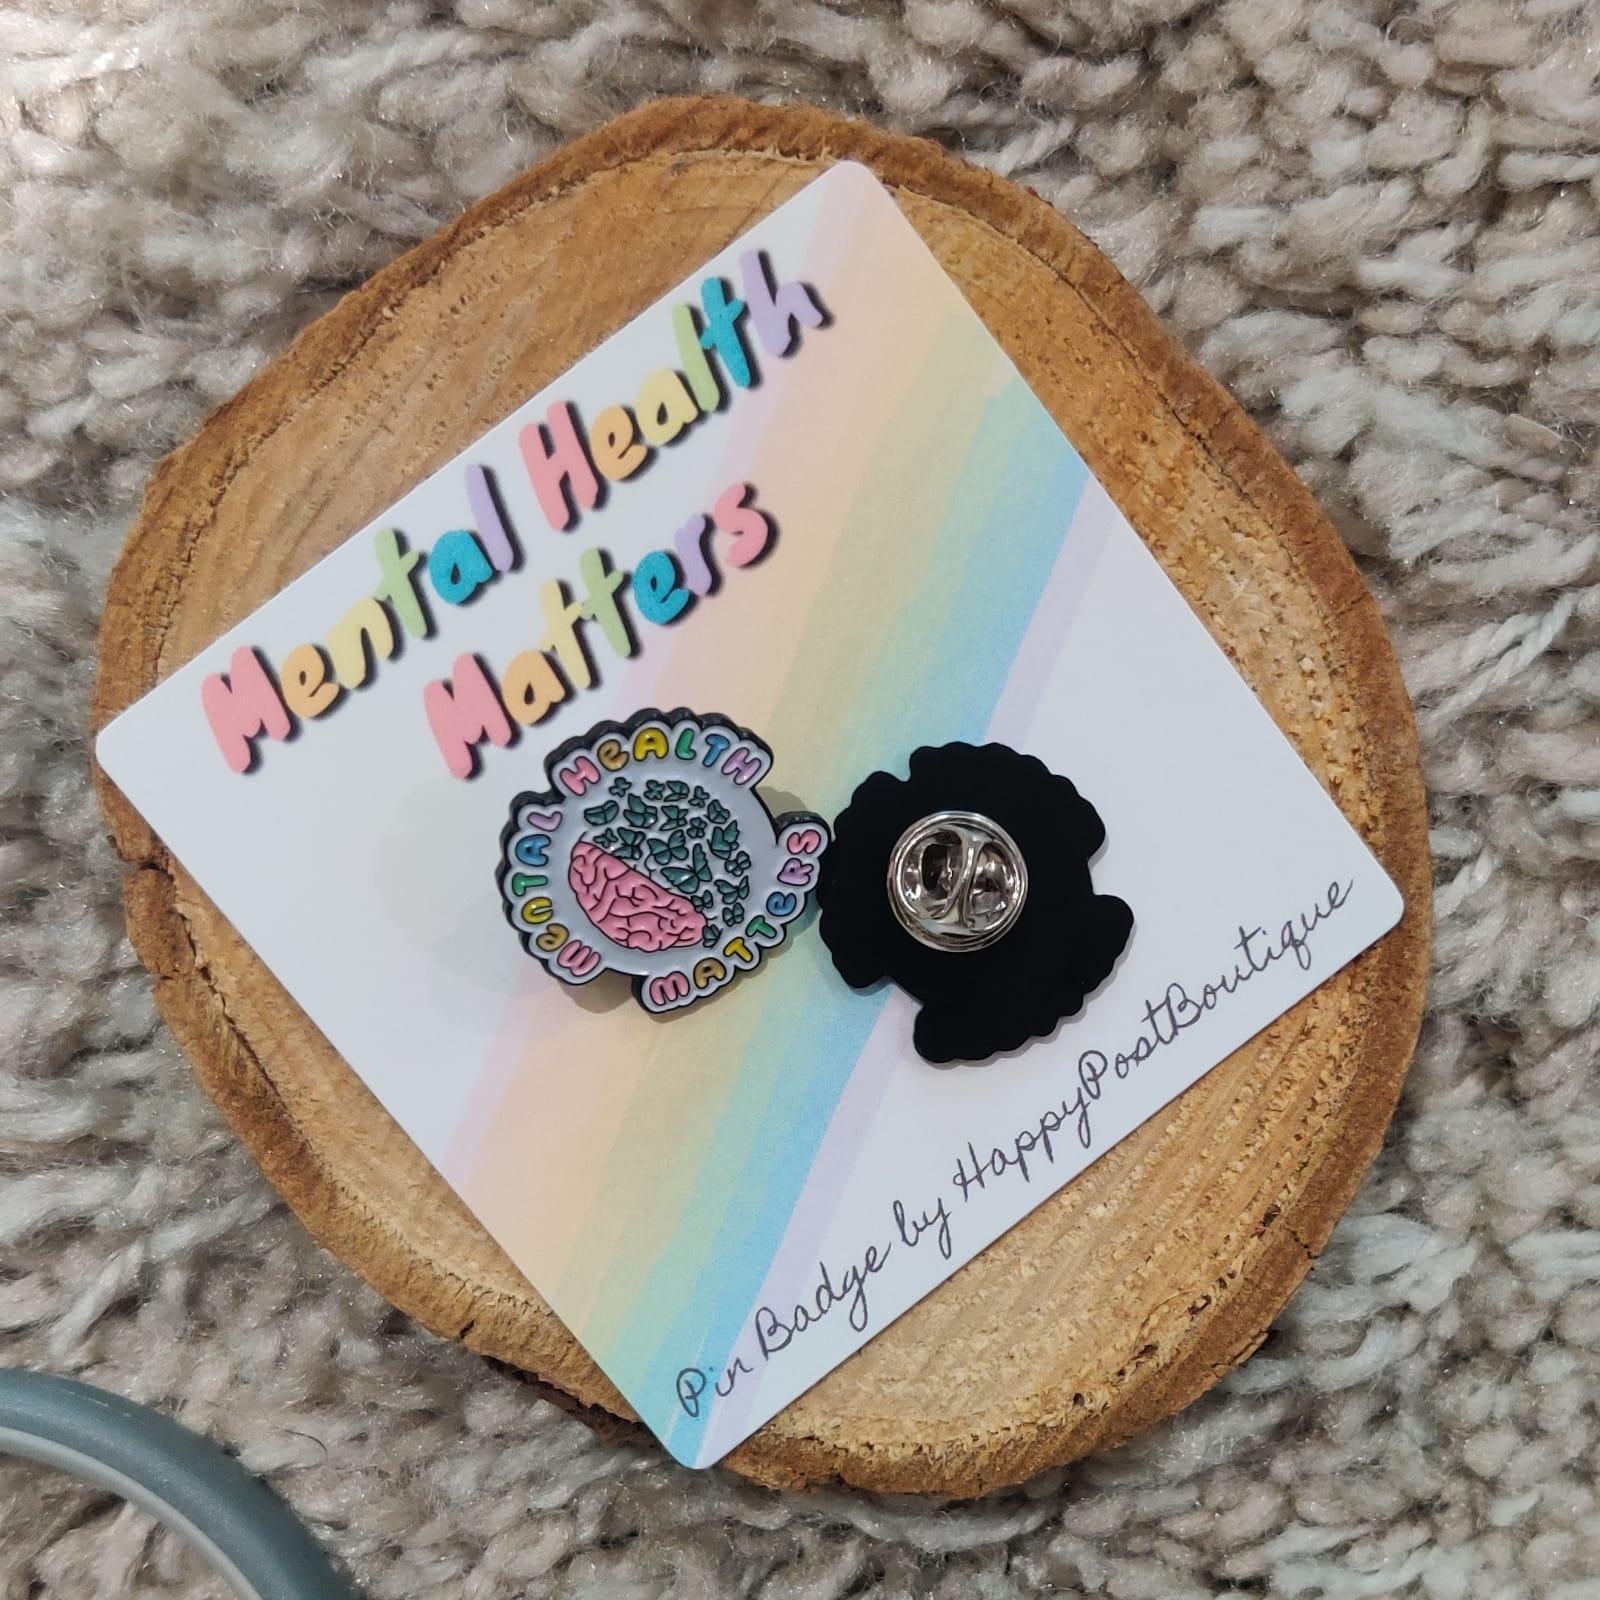 Mental Health Matters Enamel Pin Badge | Mental Health Support Pin | Mental Health is Important| Anxiety | Positivity Pin | Charity Donation Kind Shop